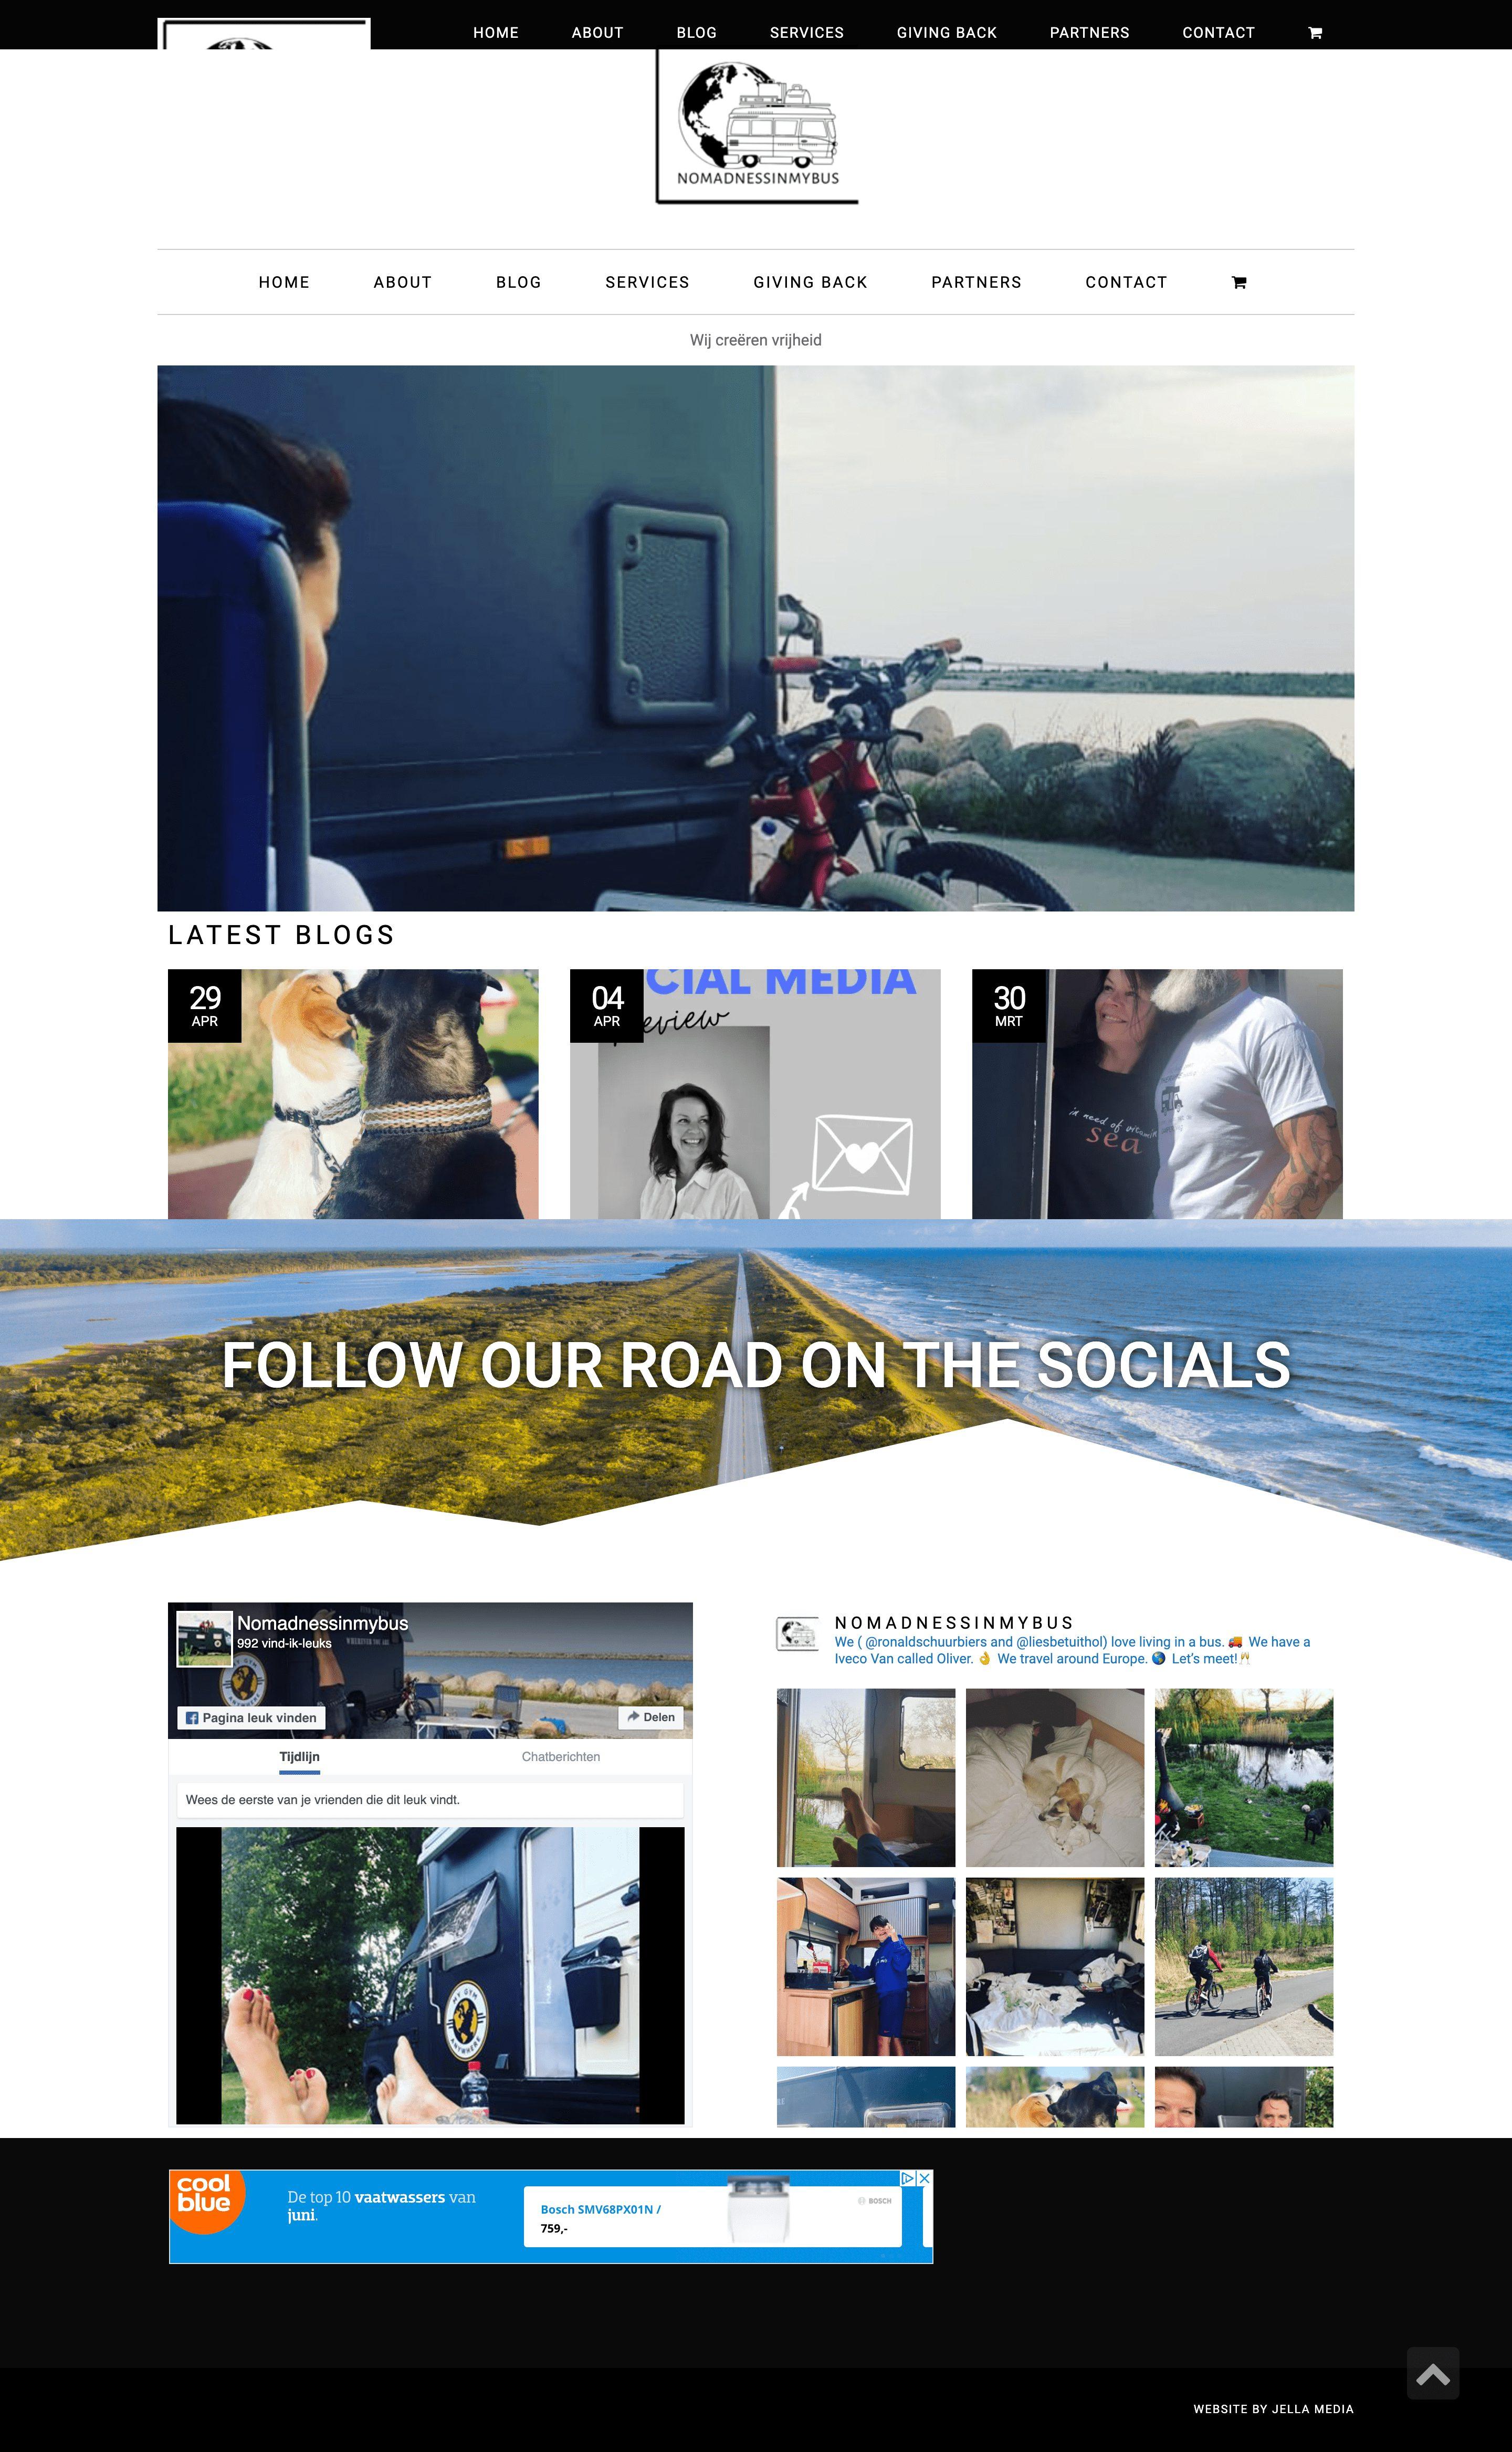 Nomadnessinmybus website door Jella media